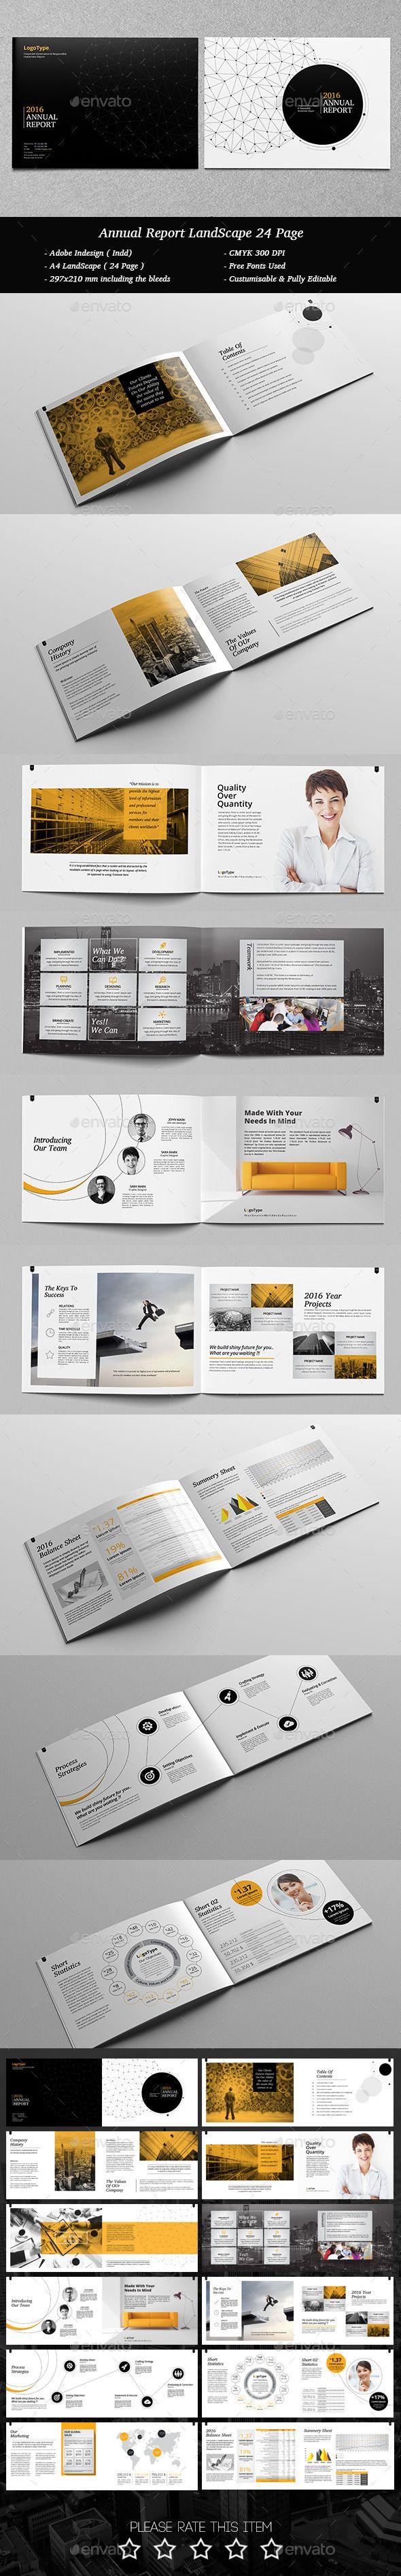 Annual Report Landscape 24 Page Template #design Download: http://graphicriver.net/item/annual-report-landscape-24-page/12475939?ref=ksioks